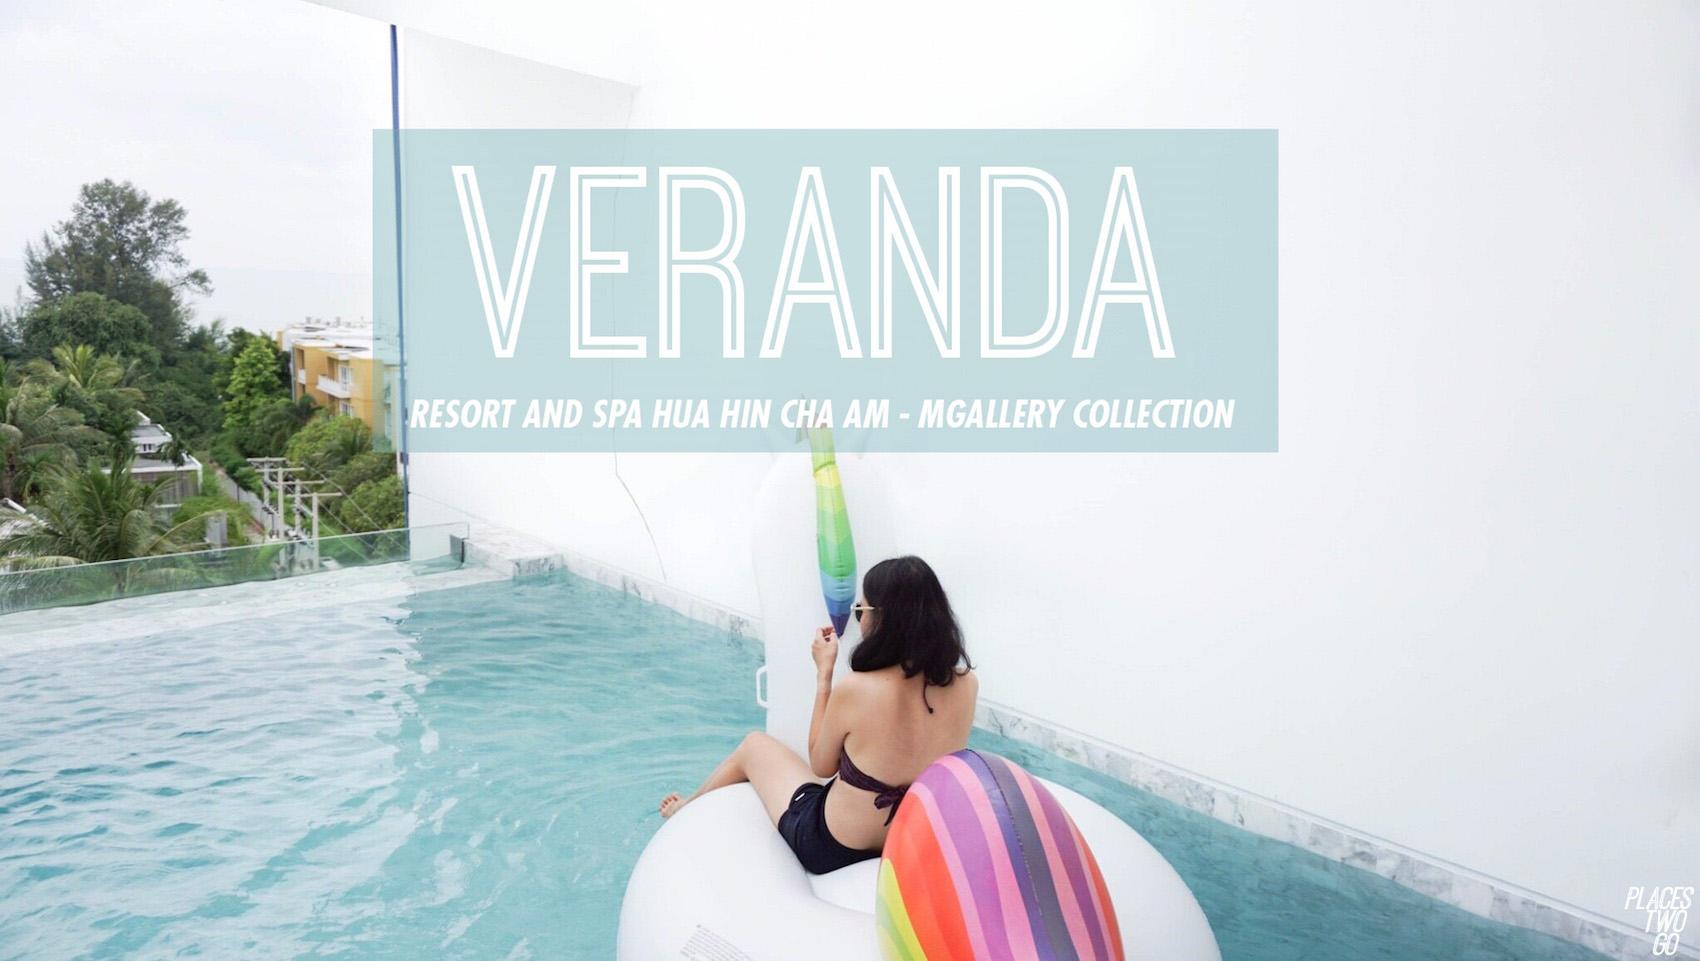 Veranda Resort And Spa Hua Hin รีสอร์ทเดิม เพิ่มเติมคือรี